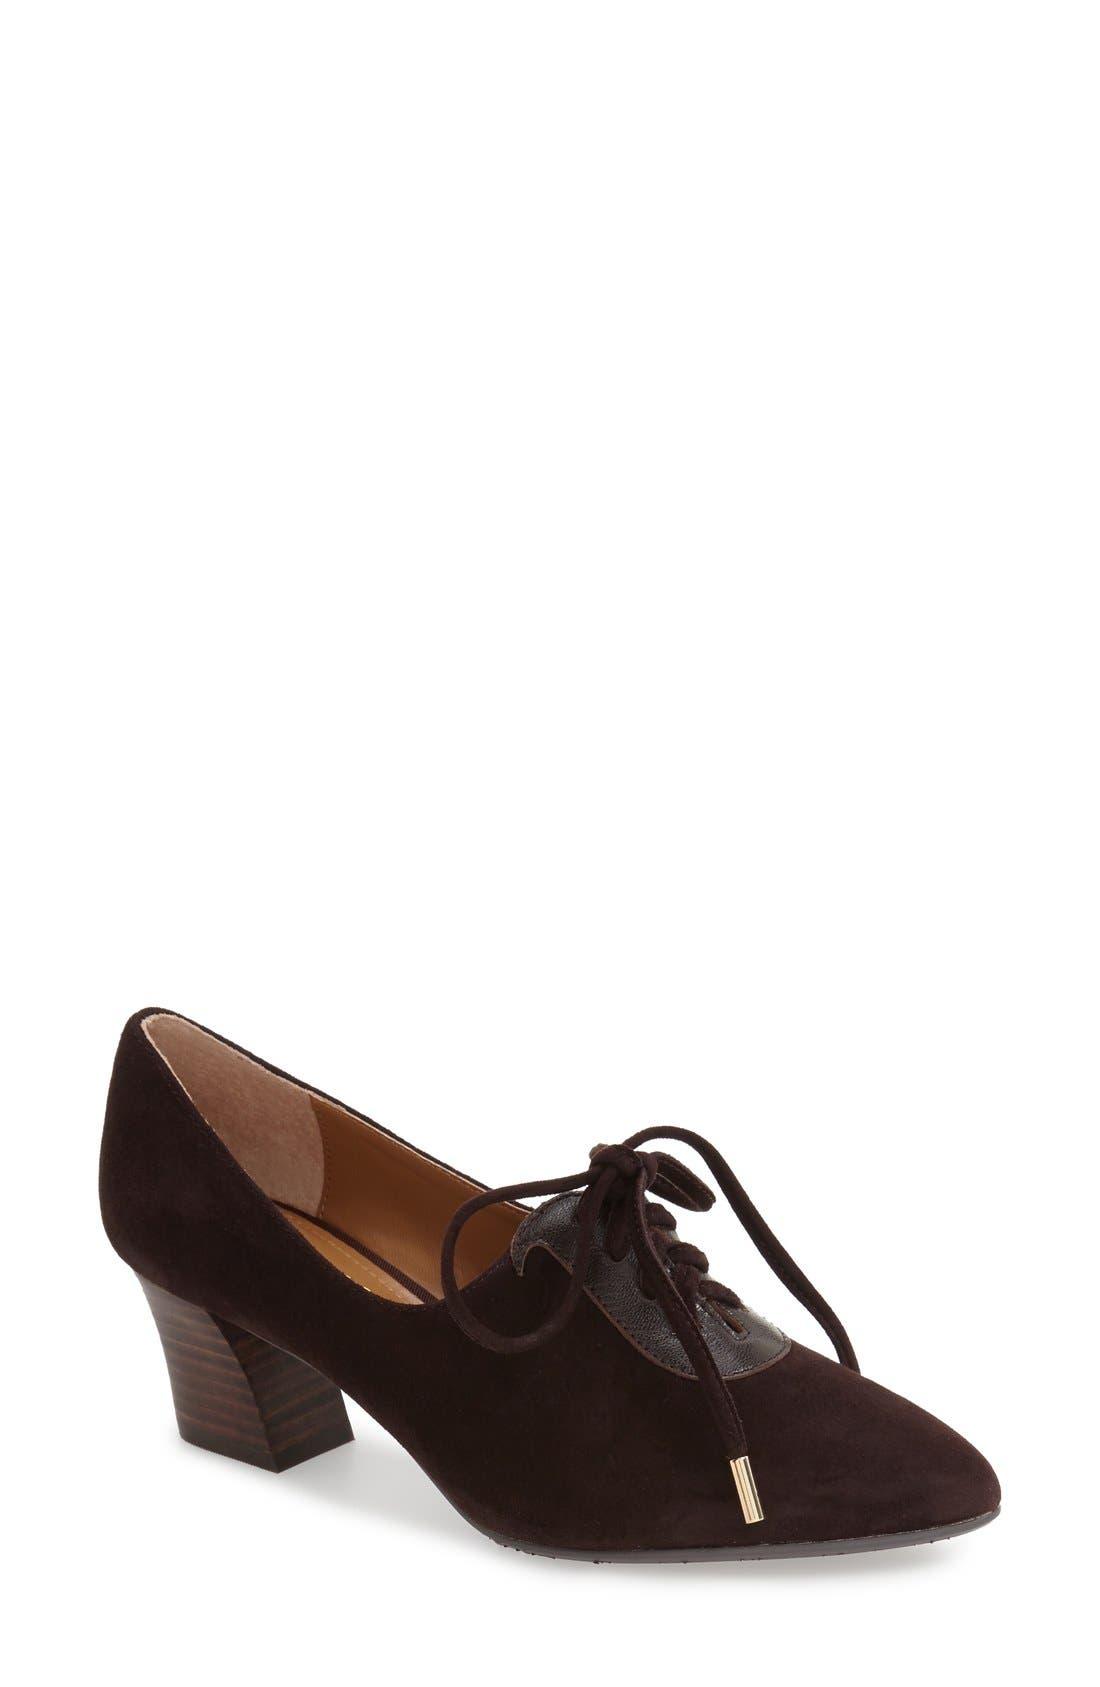 Alternate Image 1 Selected - J. Renée Ellam Pointy Toe Lace-Up Oxford (Women)